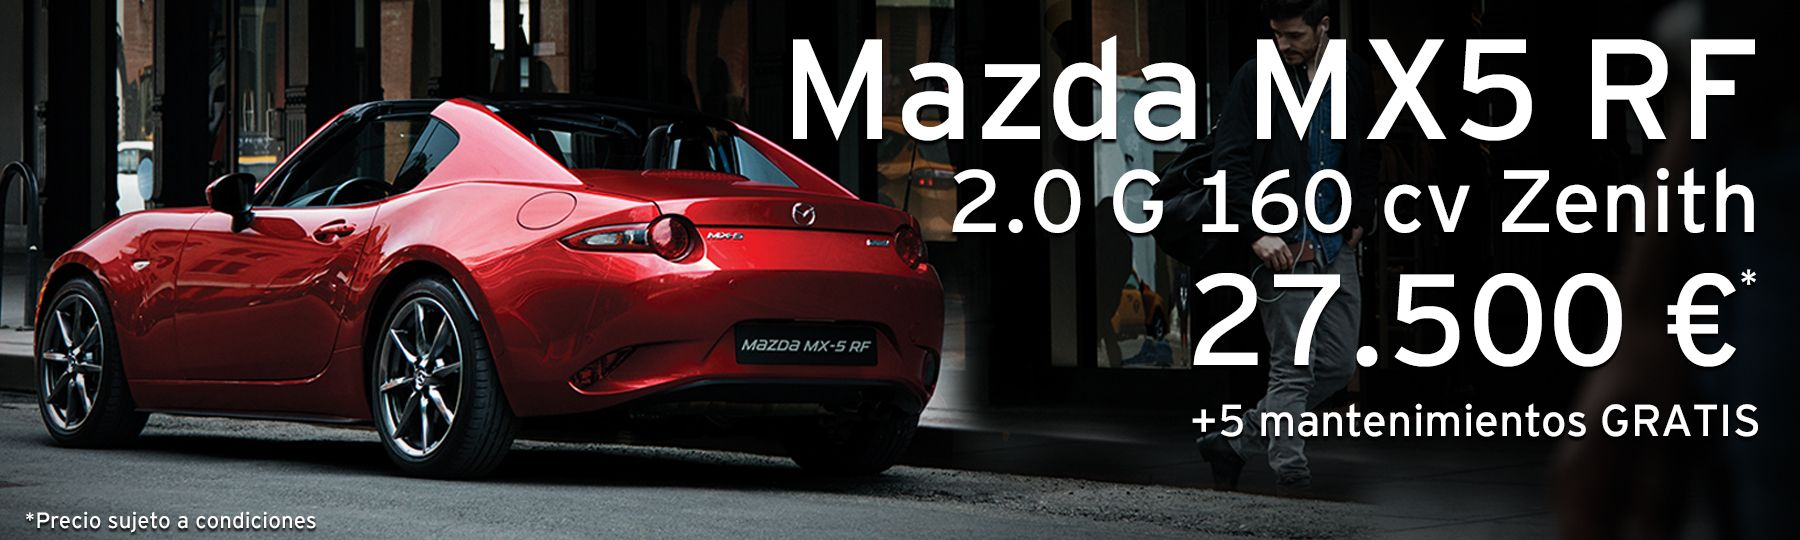 Mazda MX5 RF 2.0 G de 160 cv Soul Red Crystal